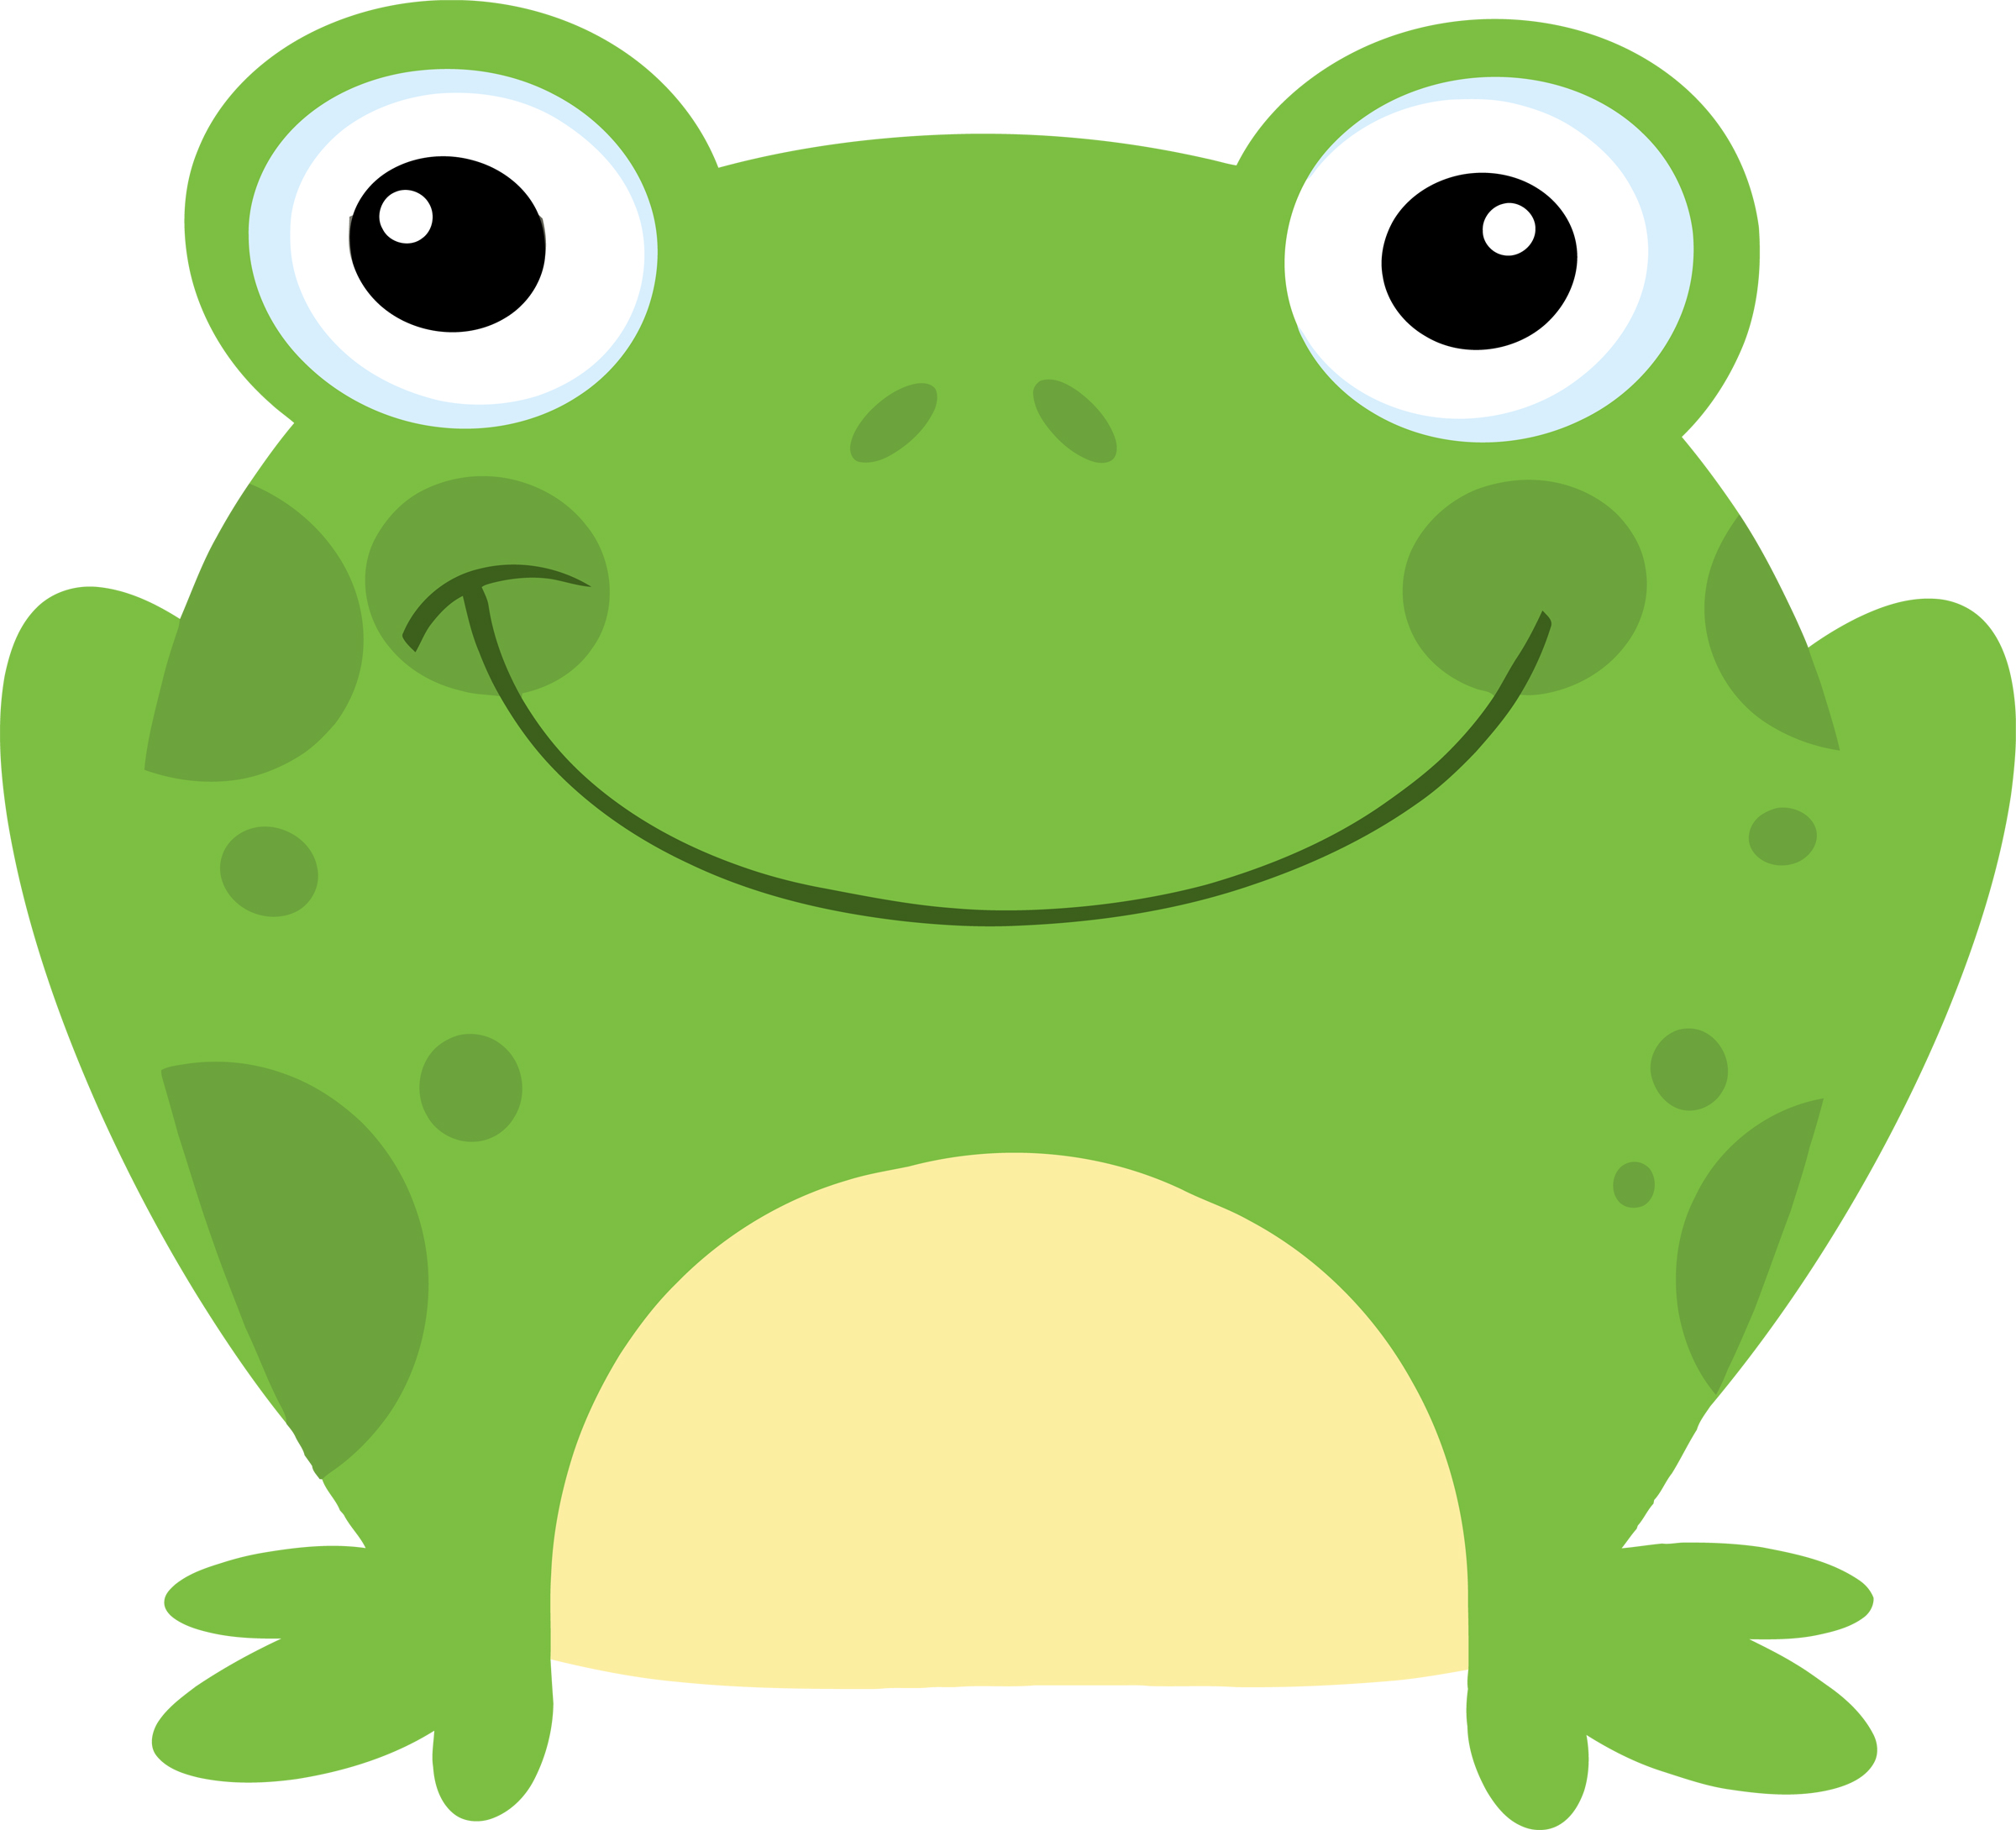 Preschool frog clipart-Preschool frog clipart-11